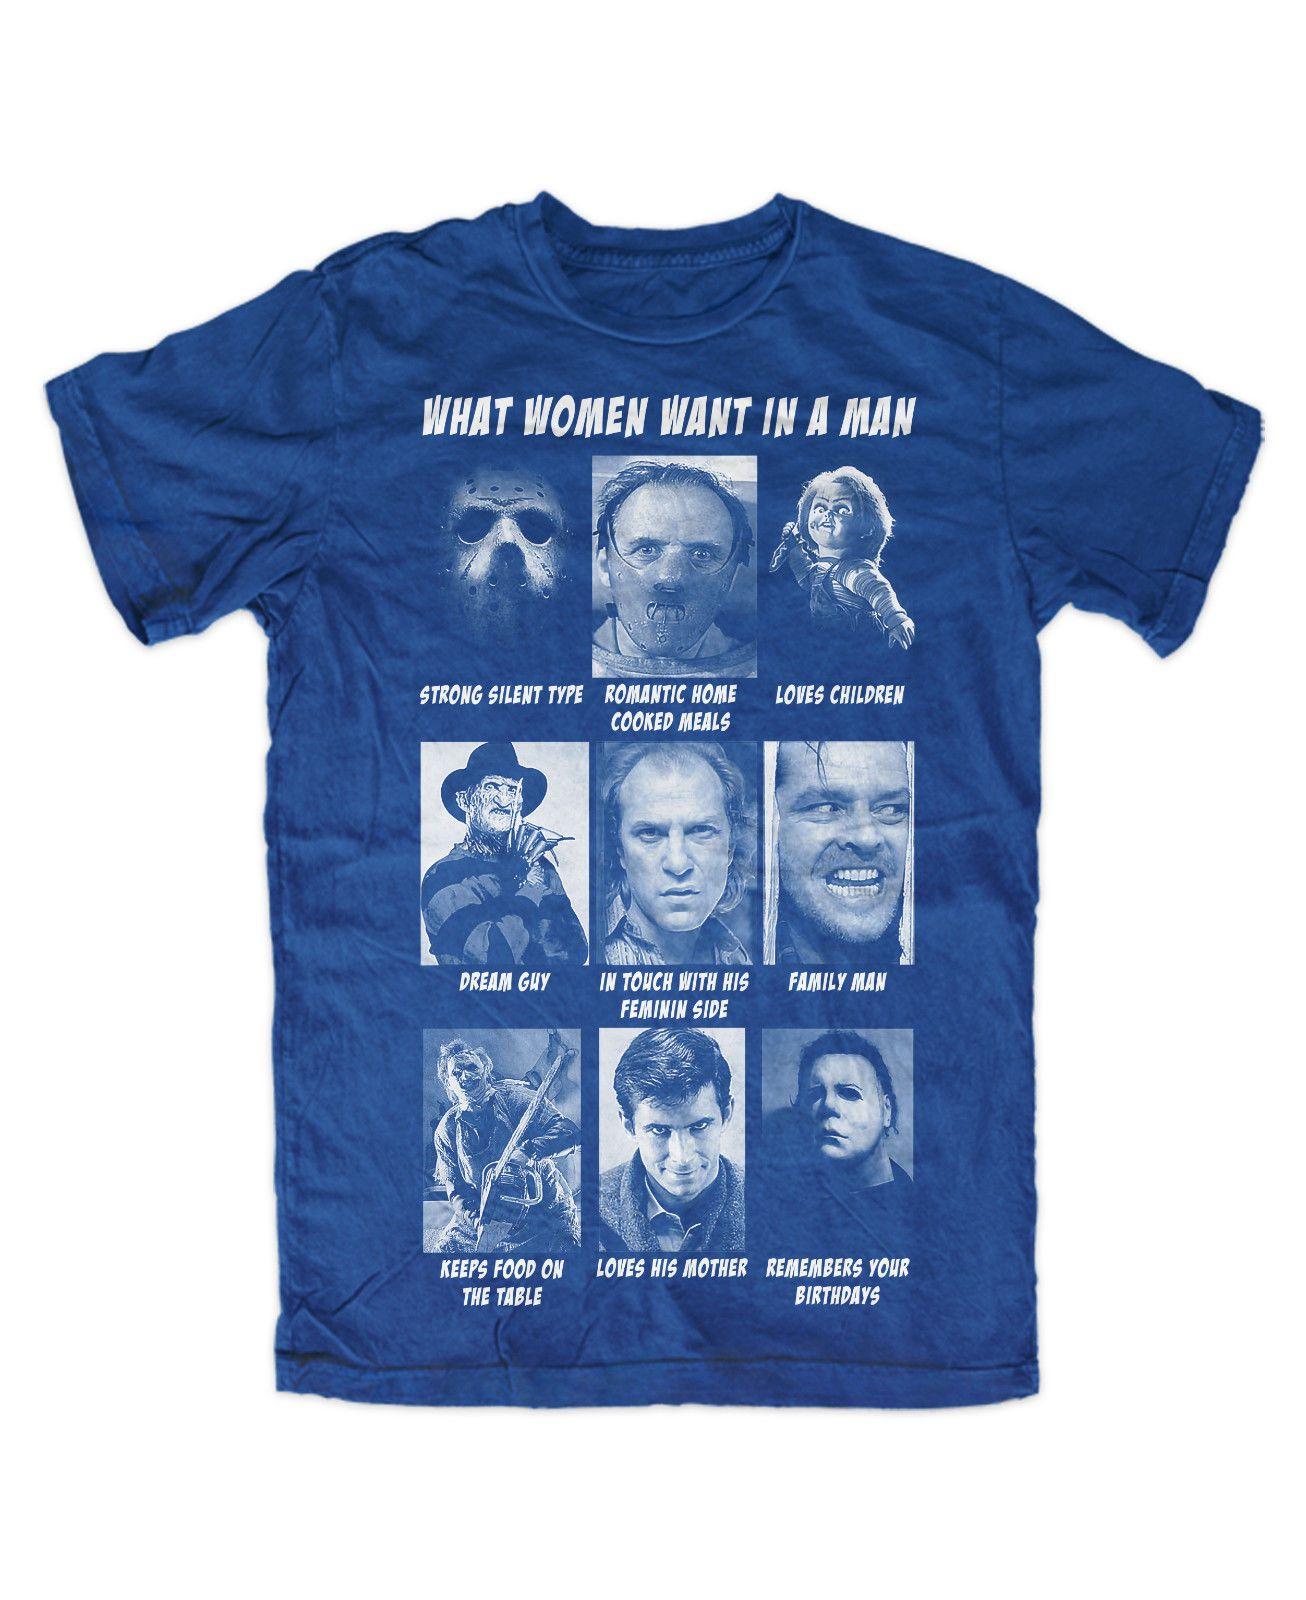 cbb9dd3fa6 What Women Want T Shirt Royal Movie,Jason,Freddy,Horror,Fun,Kult,TV,Chucky,Bad  Crazy T Shirts Designs Ridiculous T Shirt From Kihalhabib, $10.85|  DHgate.Com